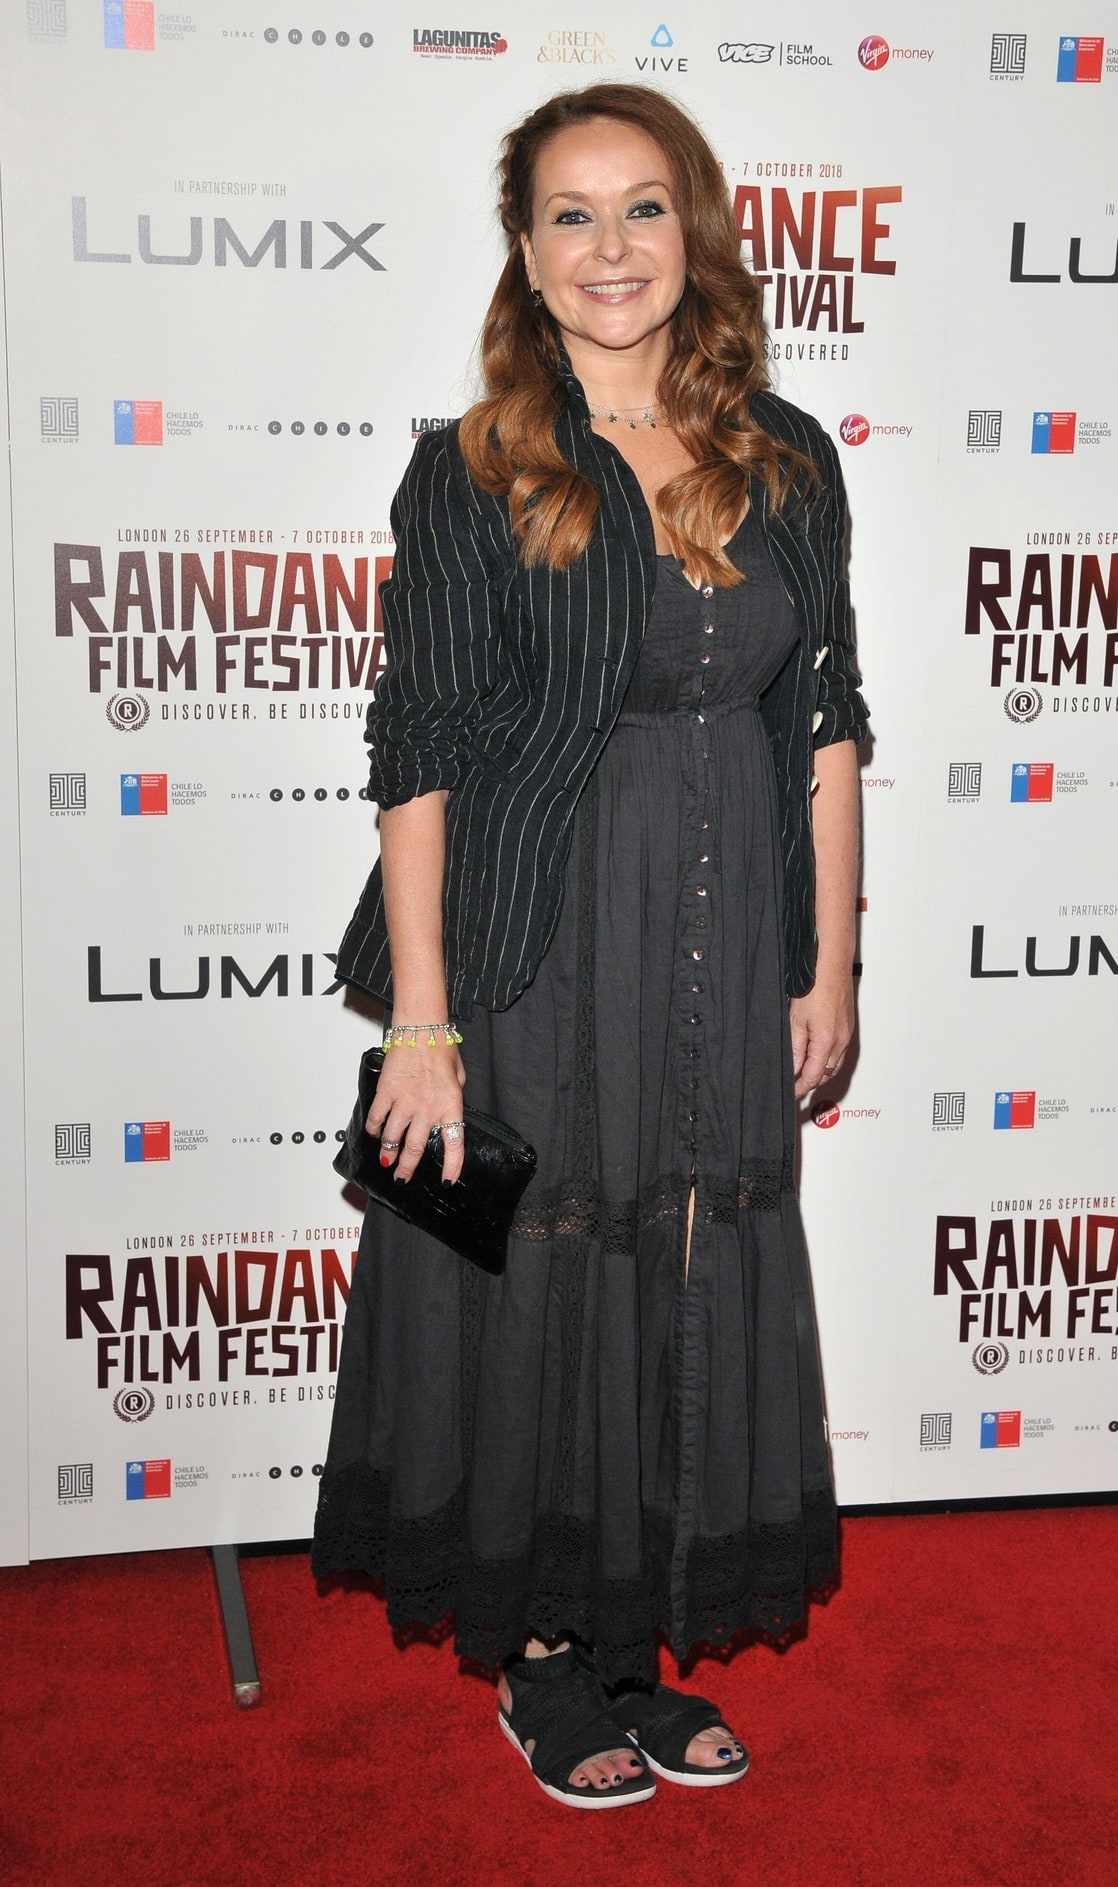 Christina Pickles,Rachael Beck Adult videos Bianca Guaccero (born 1981),Maeve McGuire